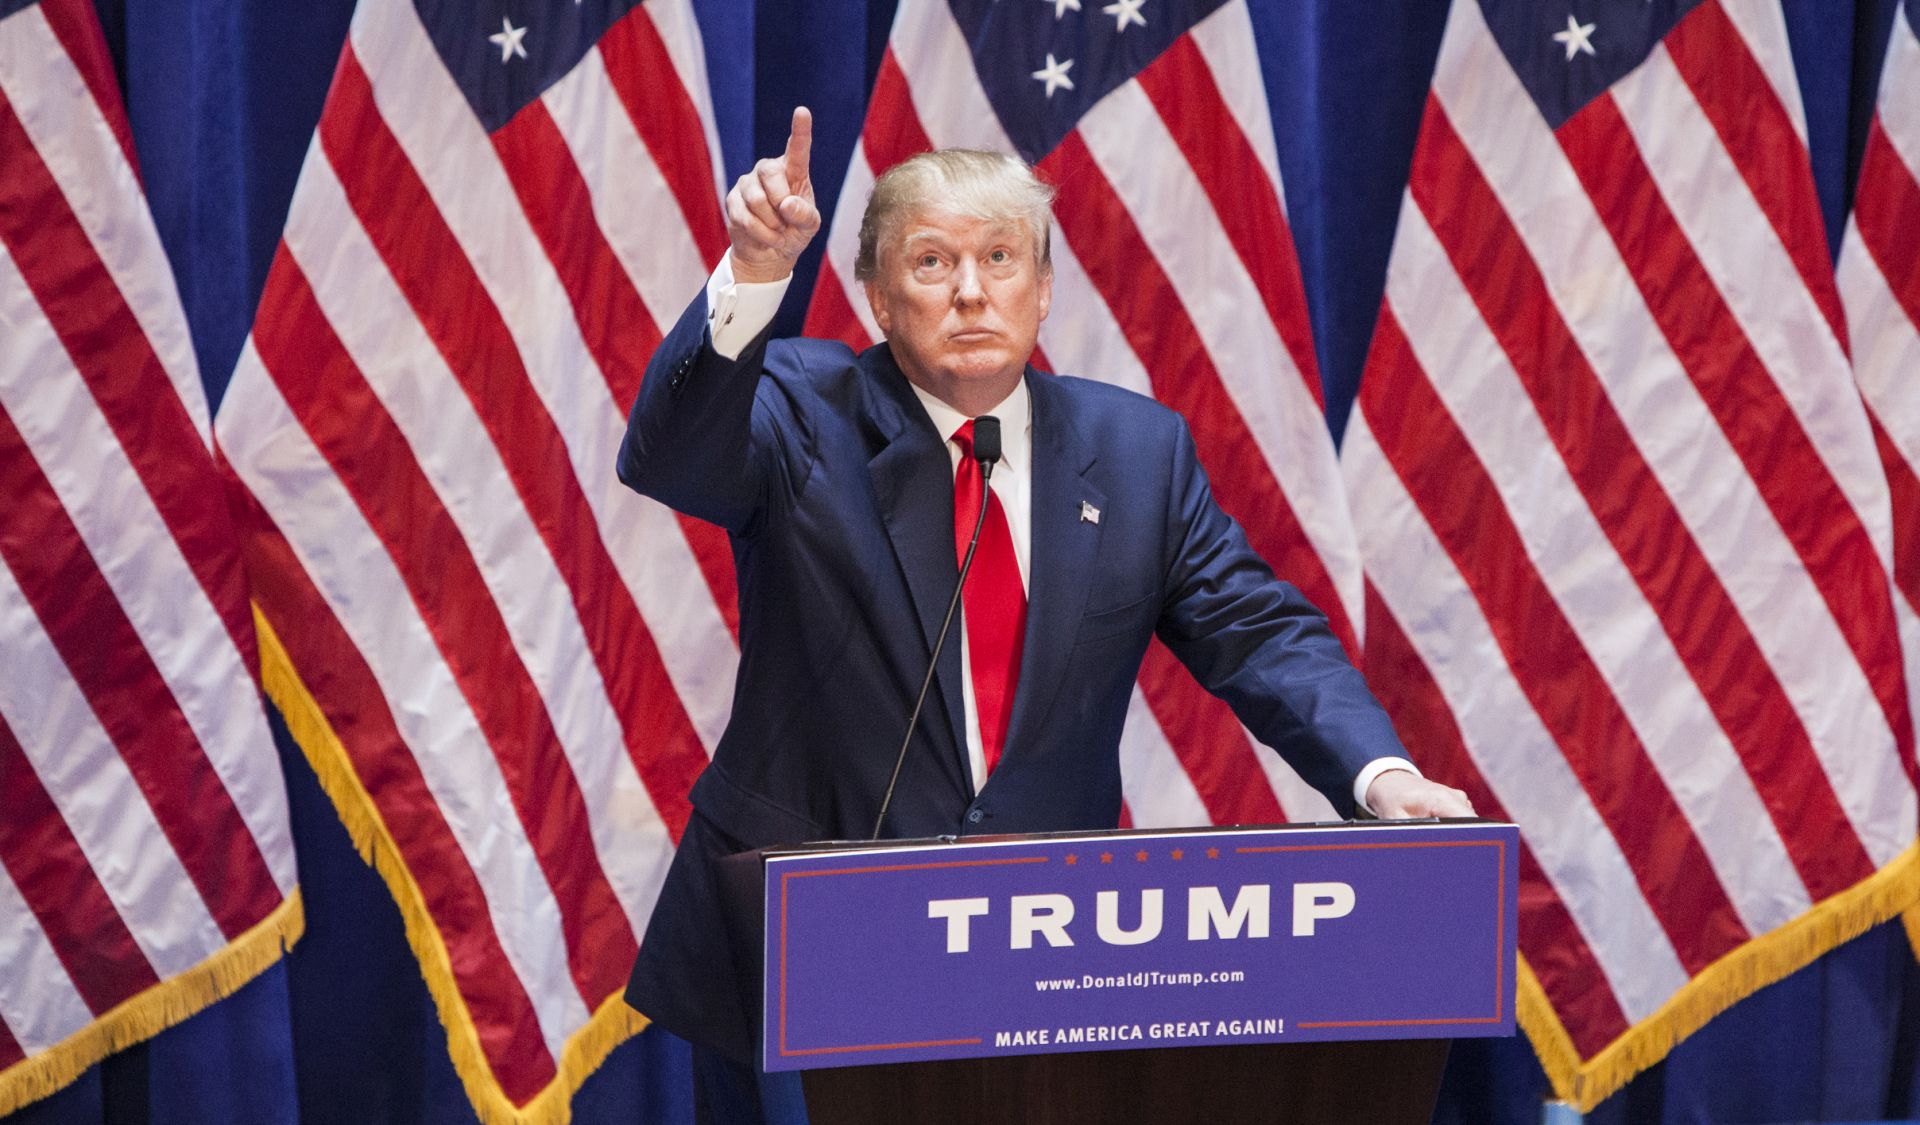 Trump povećao prednost pred republikanskim protukandidatima